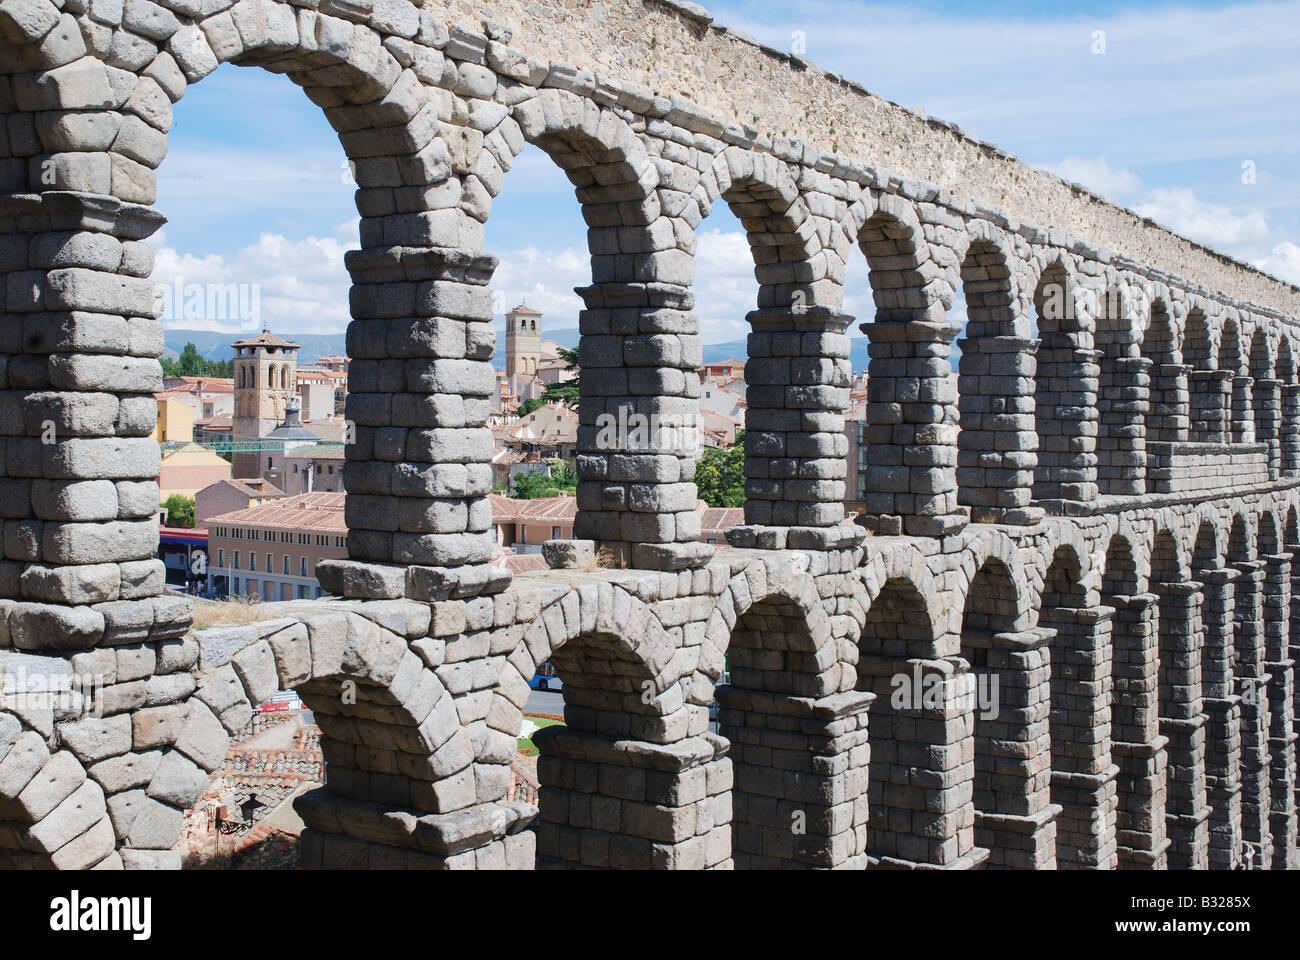 The Roman Aqueduct. Segovia. Castile Leon. Spain. - Stock Image